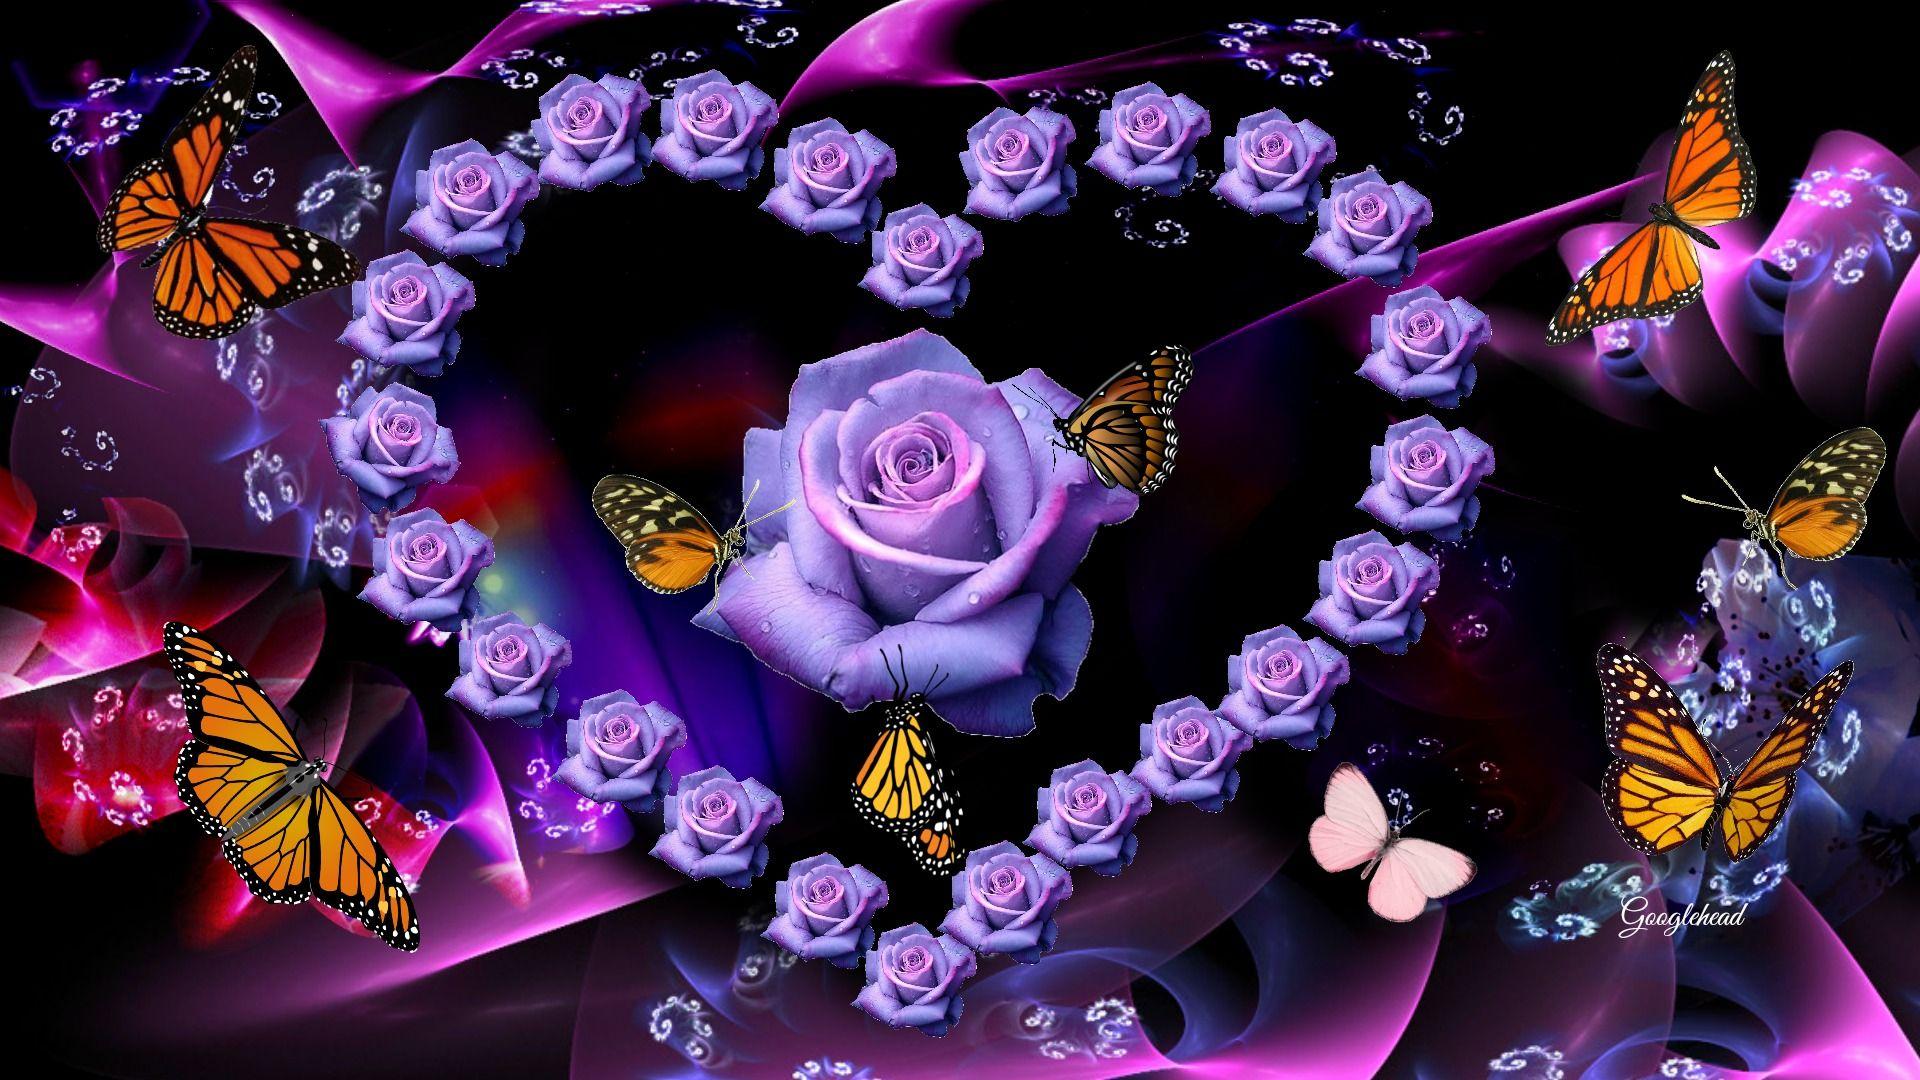 Roses Heart Butterflies Fantasy Hd Desktop Background ...